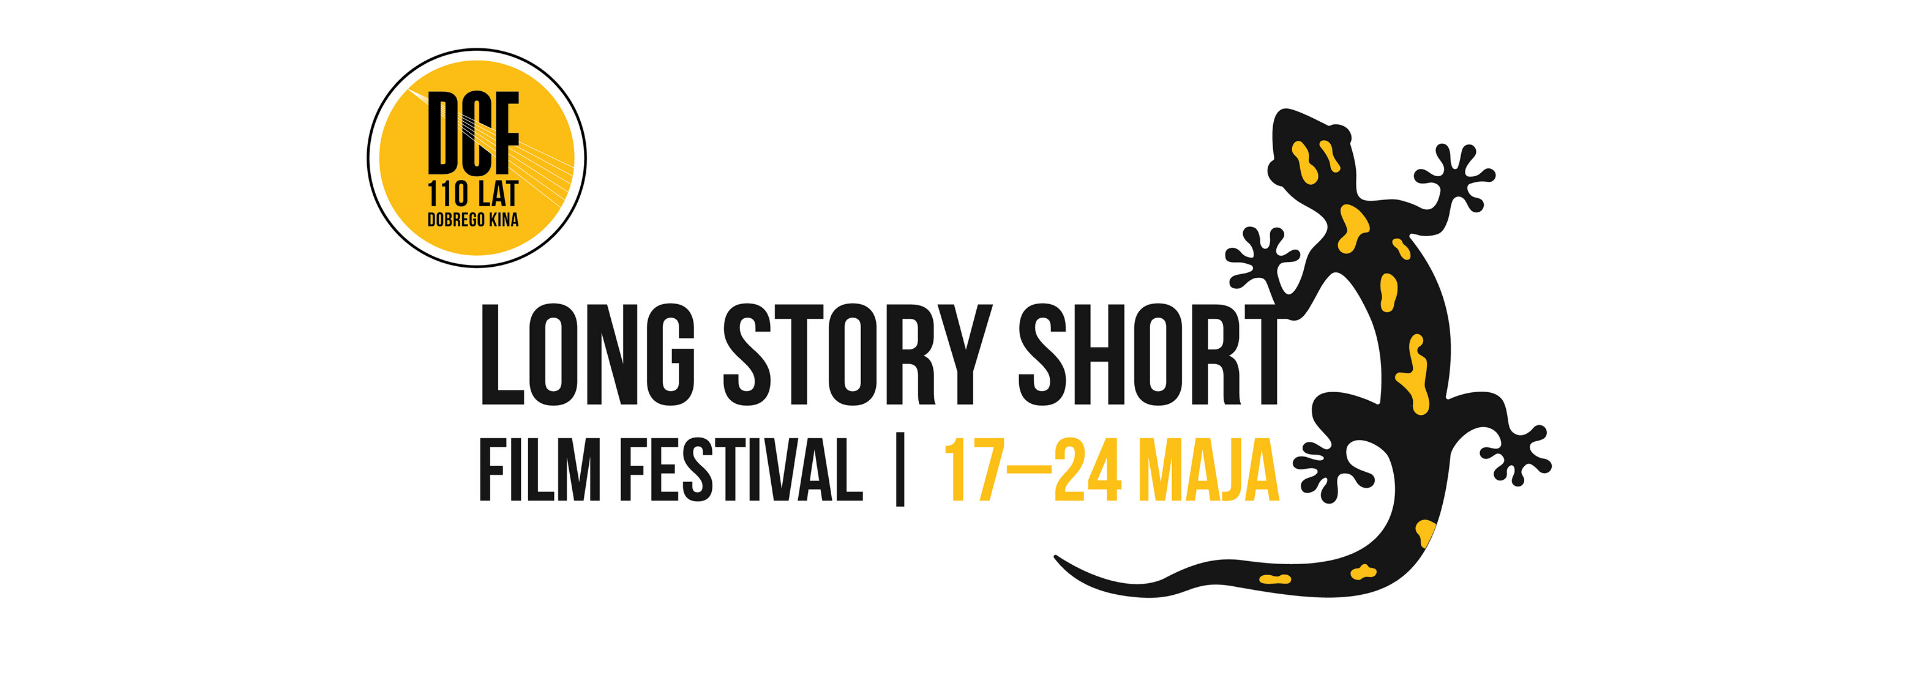 Shortfilm festival 2020